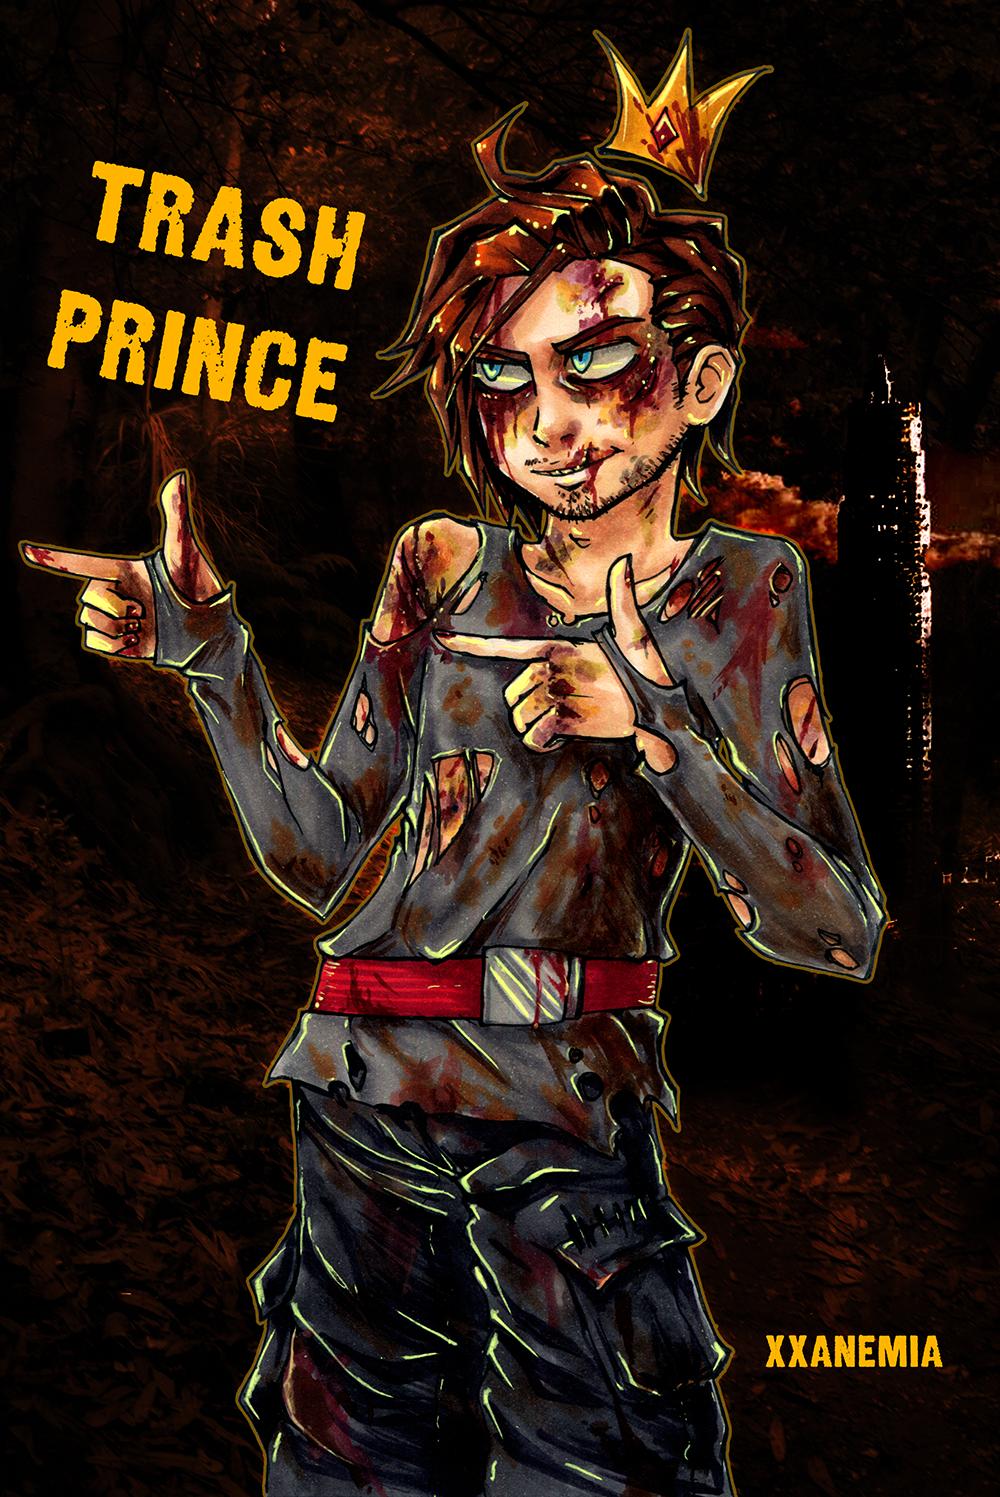 Trash Prince